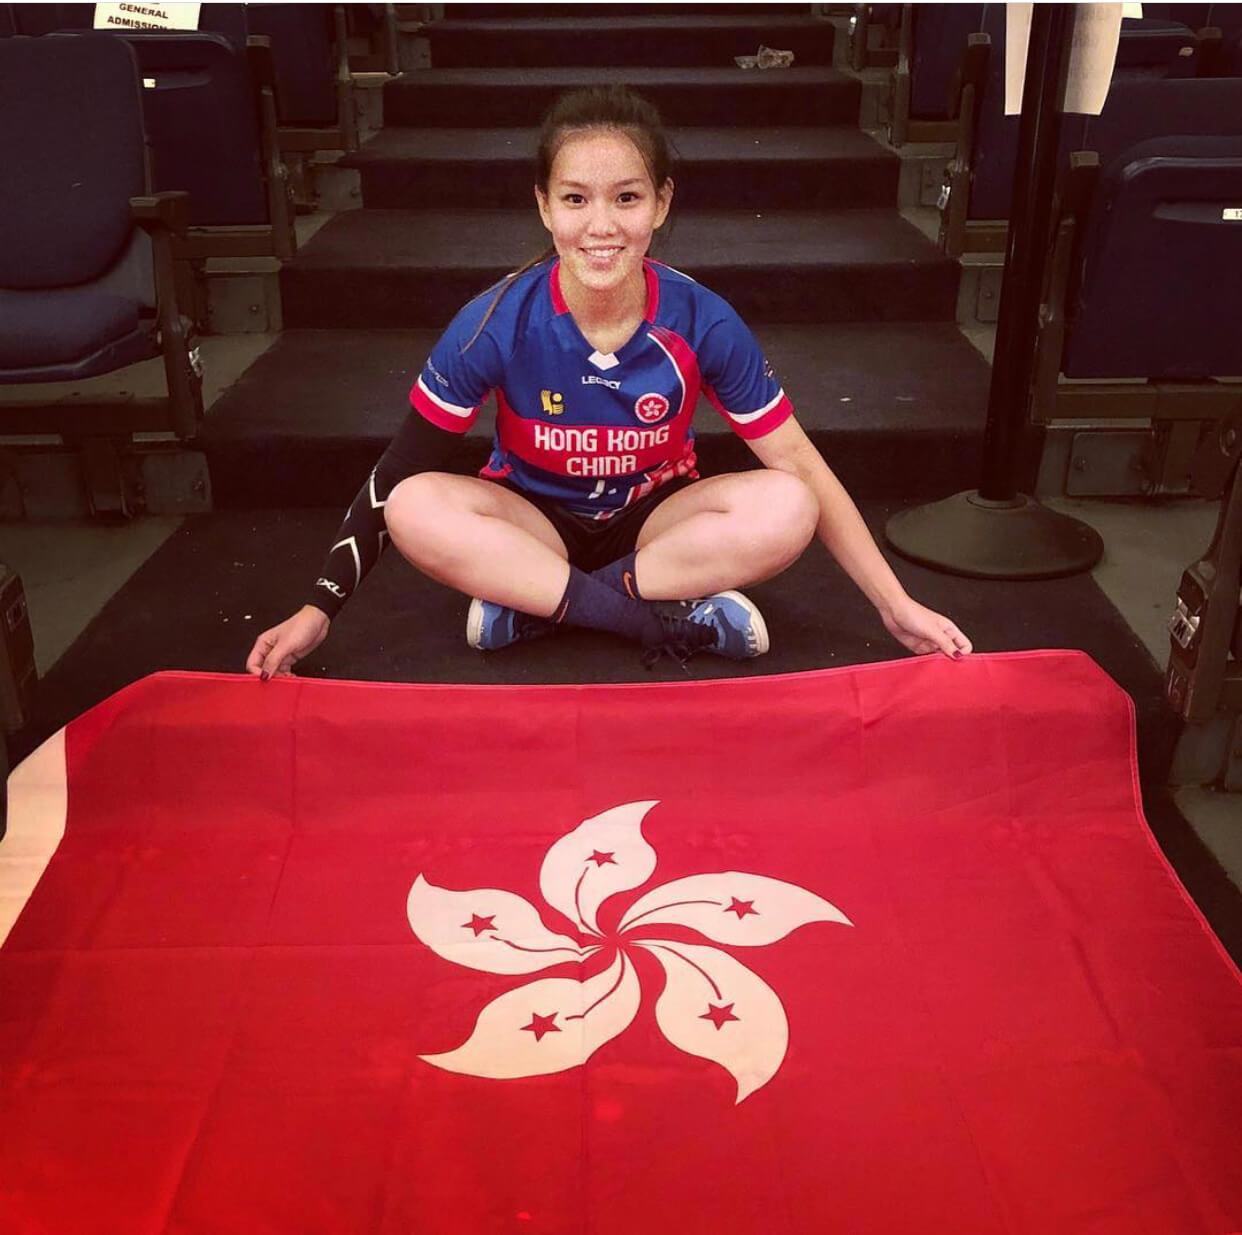 Christy讀書時代表香港到美國參加閃避球世界賽,得到第四名。